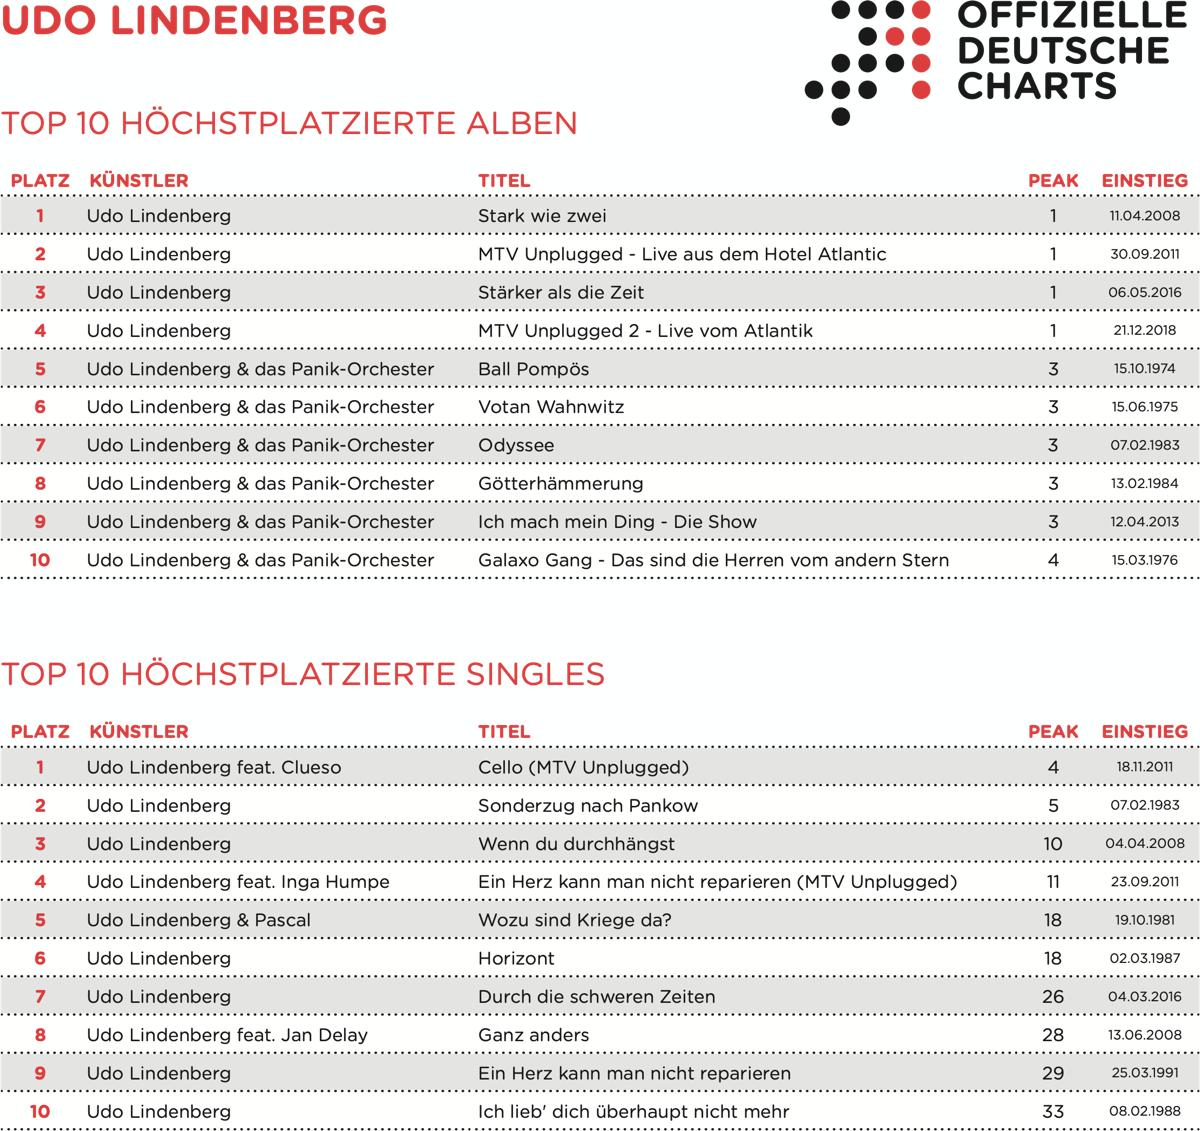 Udo Lindenberg über 1.000 Mal in Charts platziert